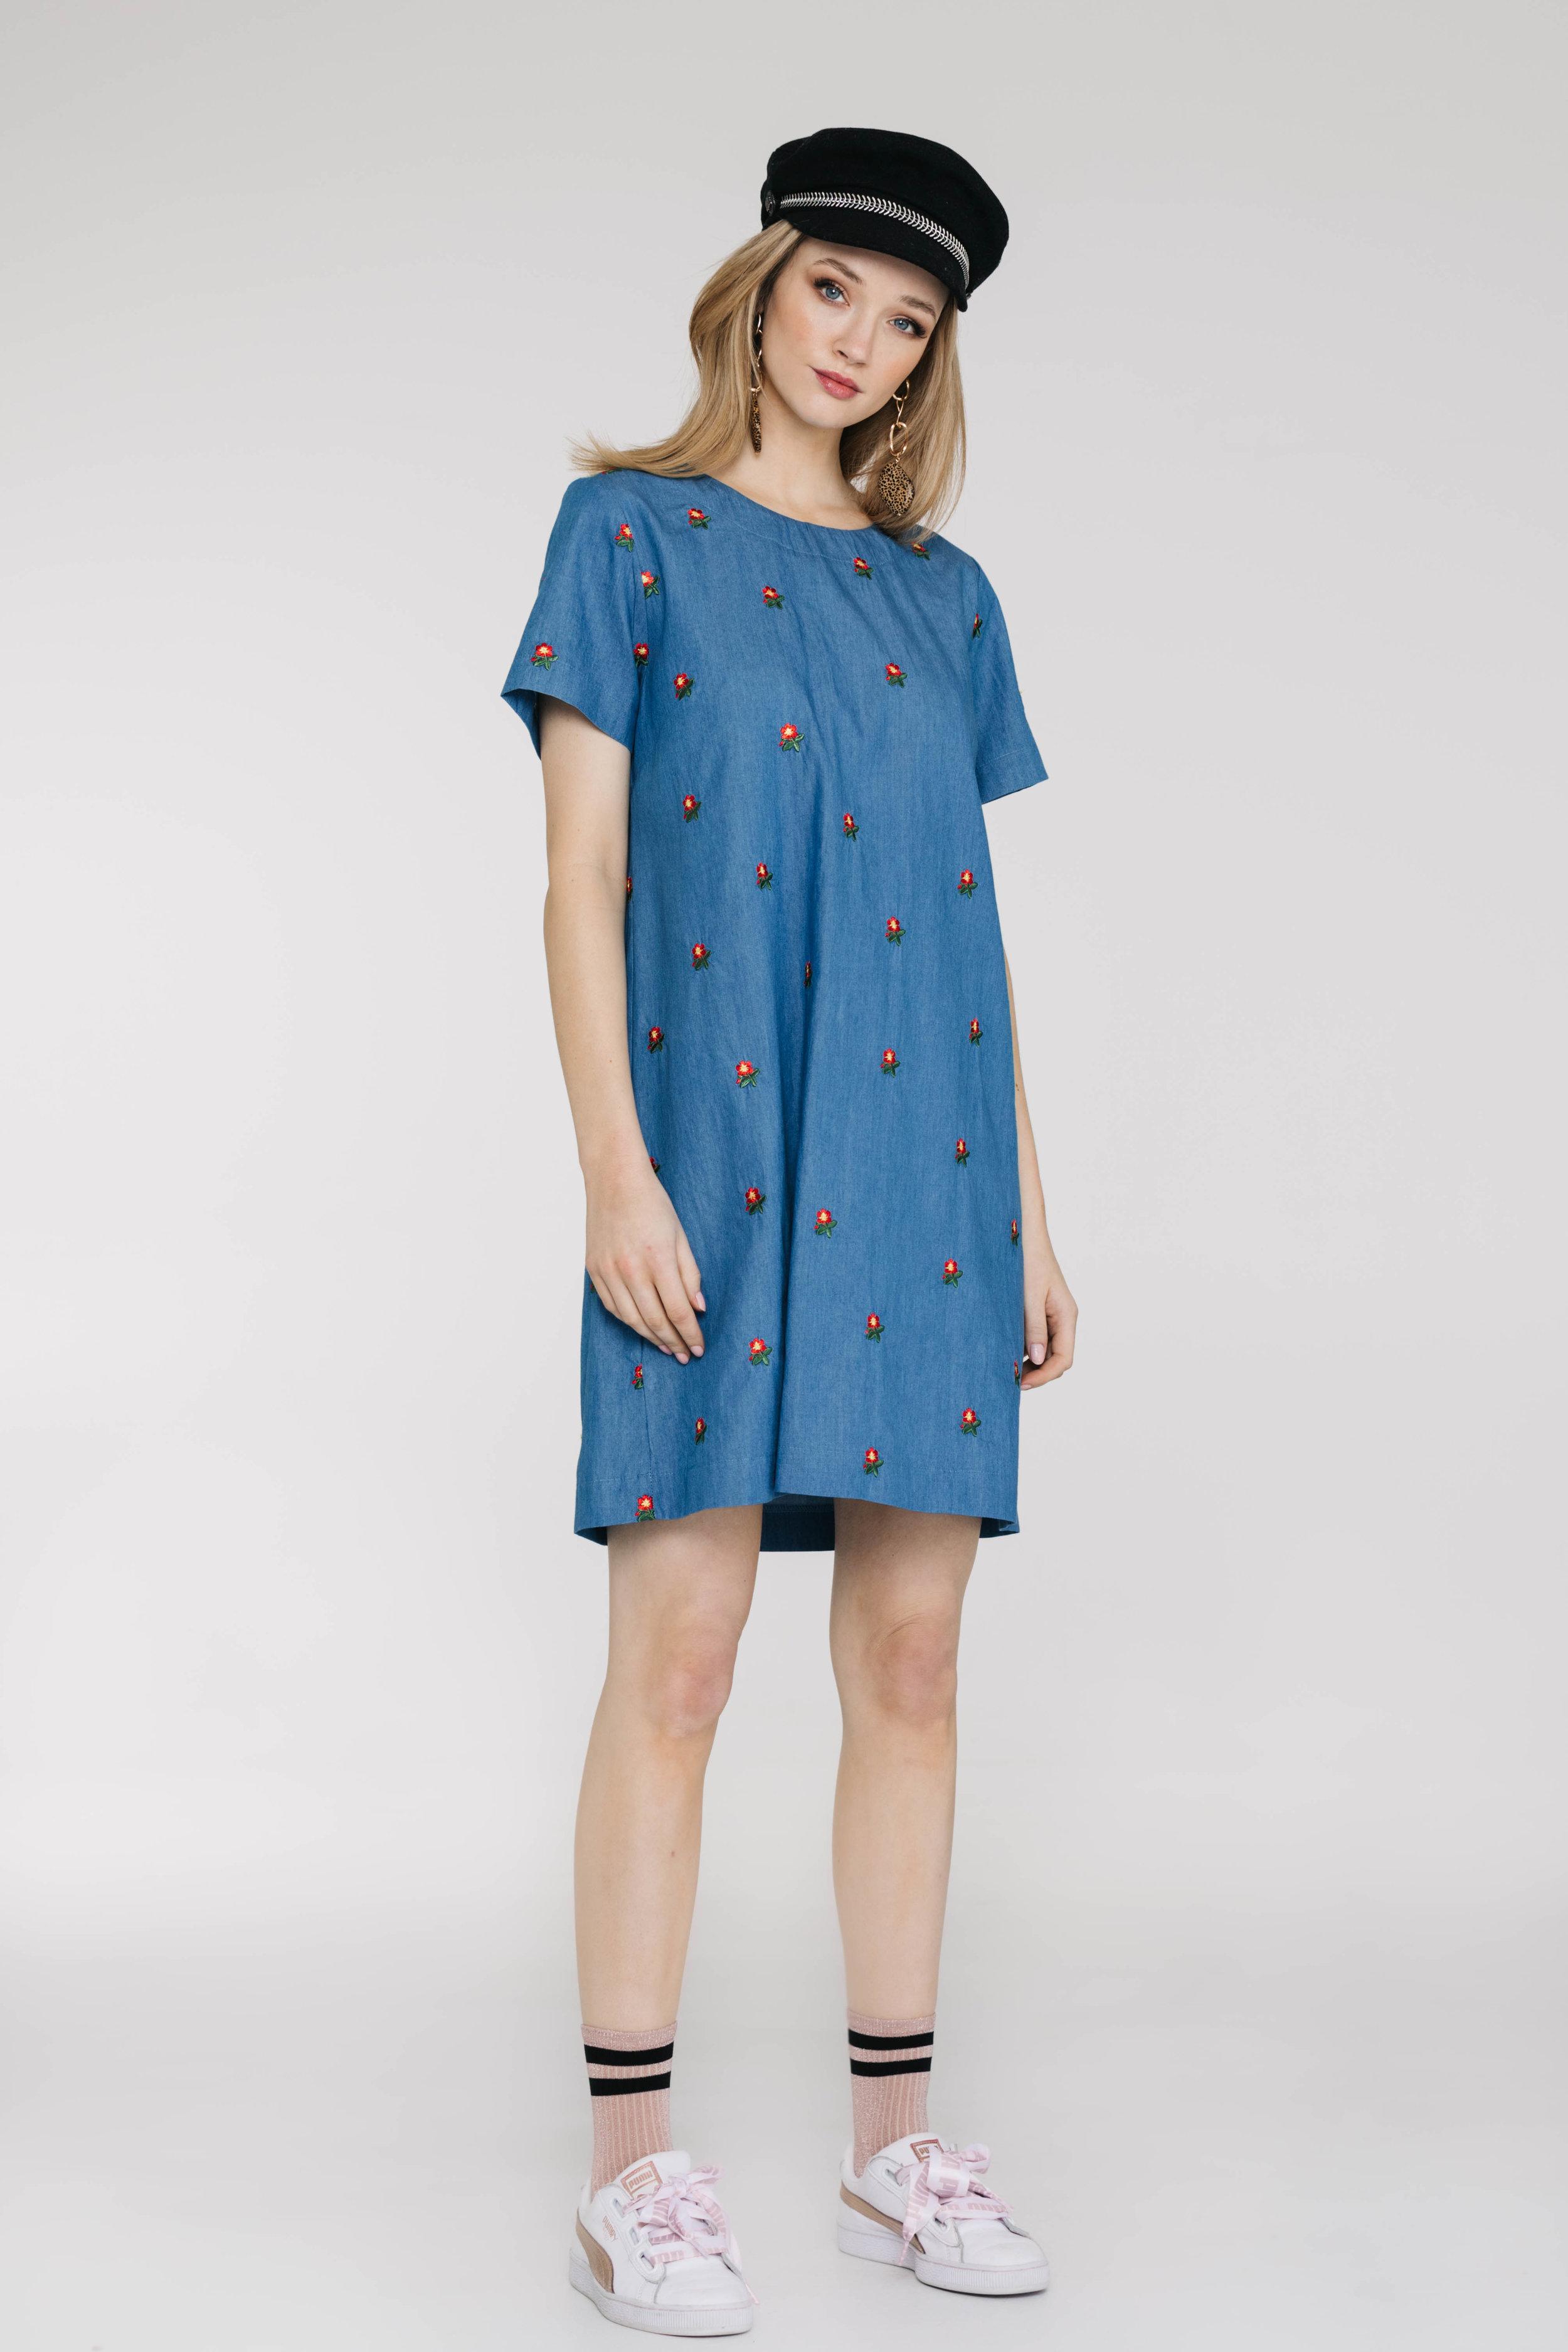 Factory Dress 6019N Light Denim